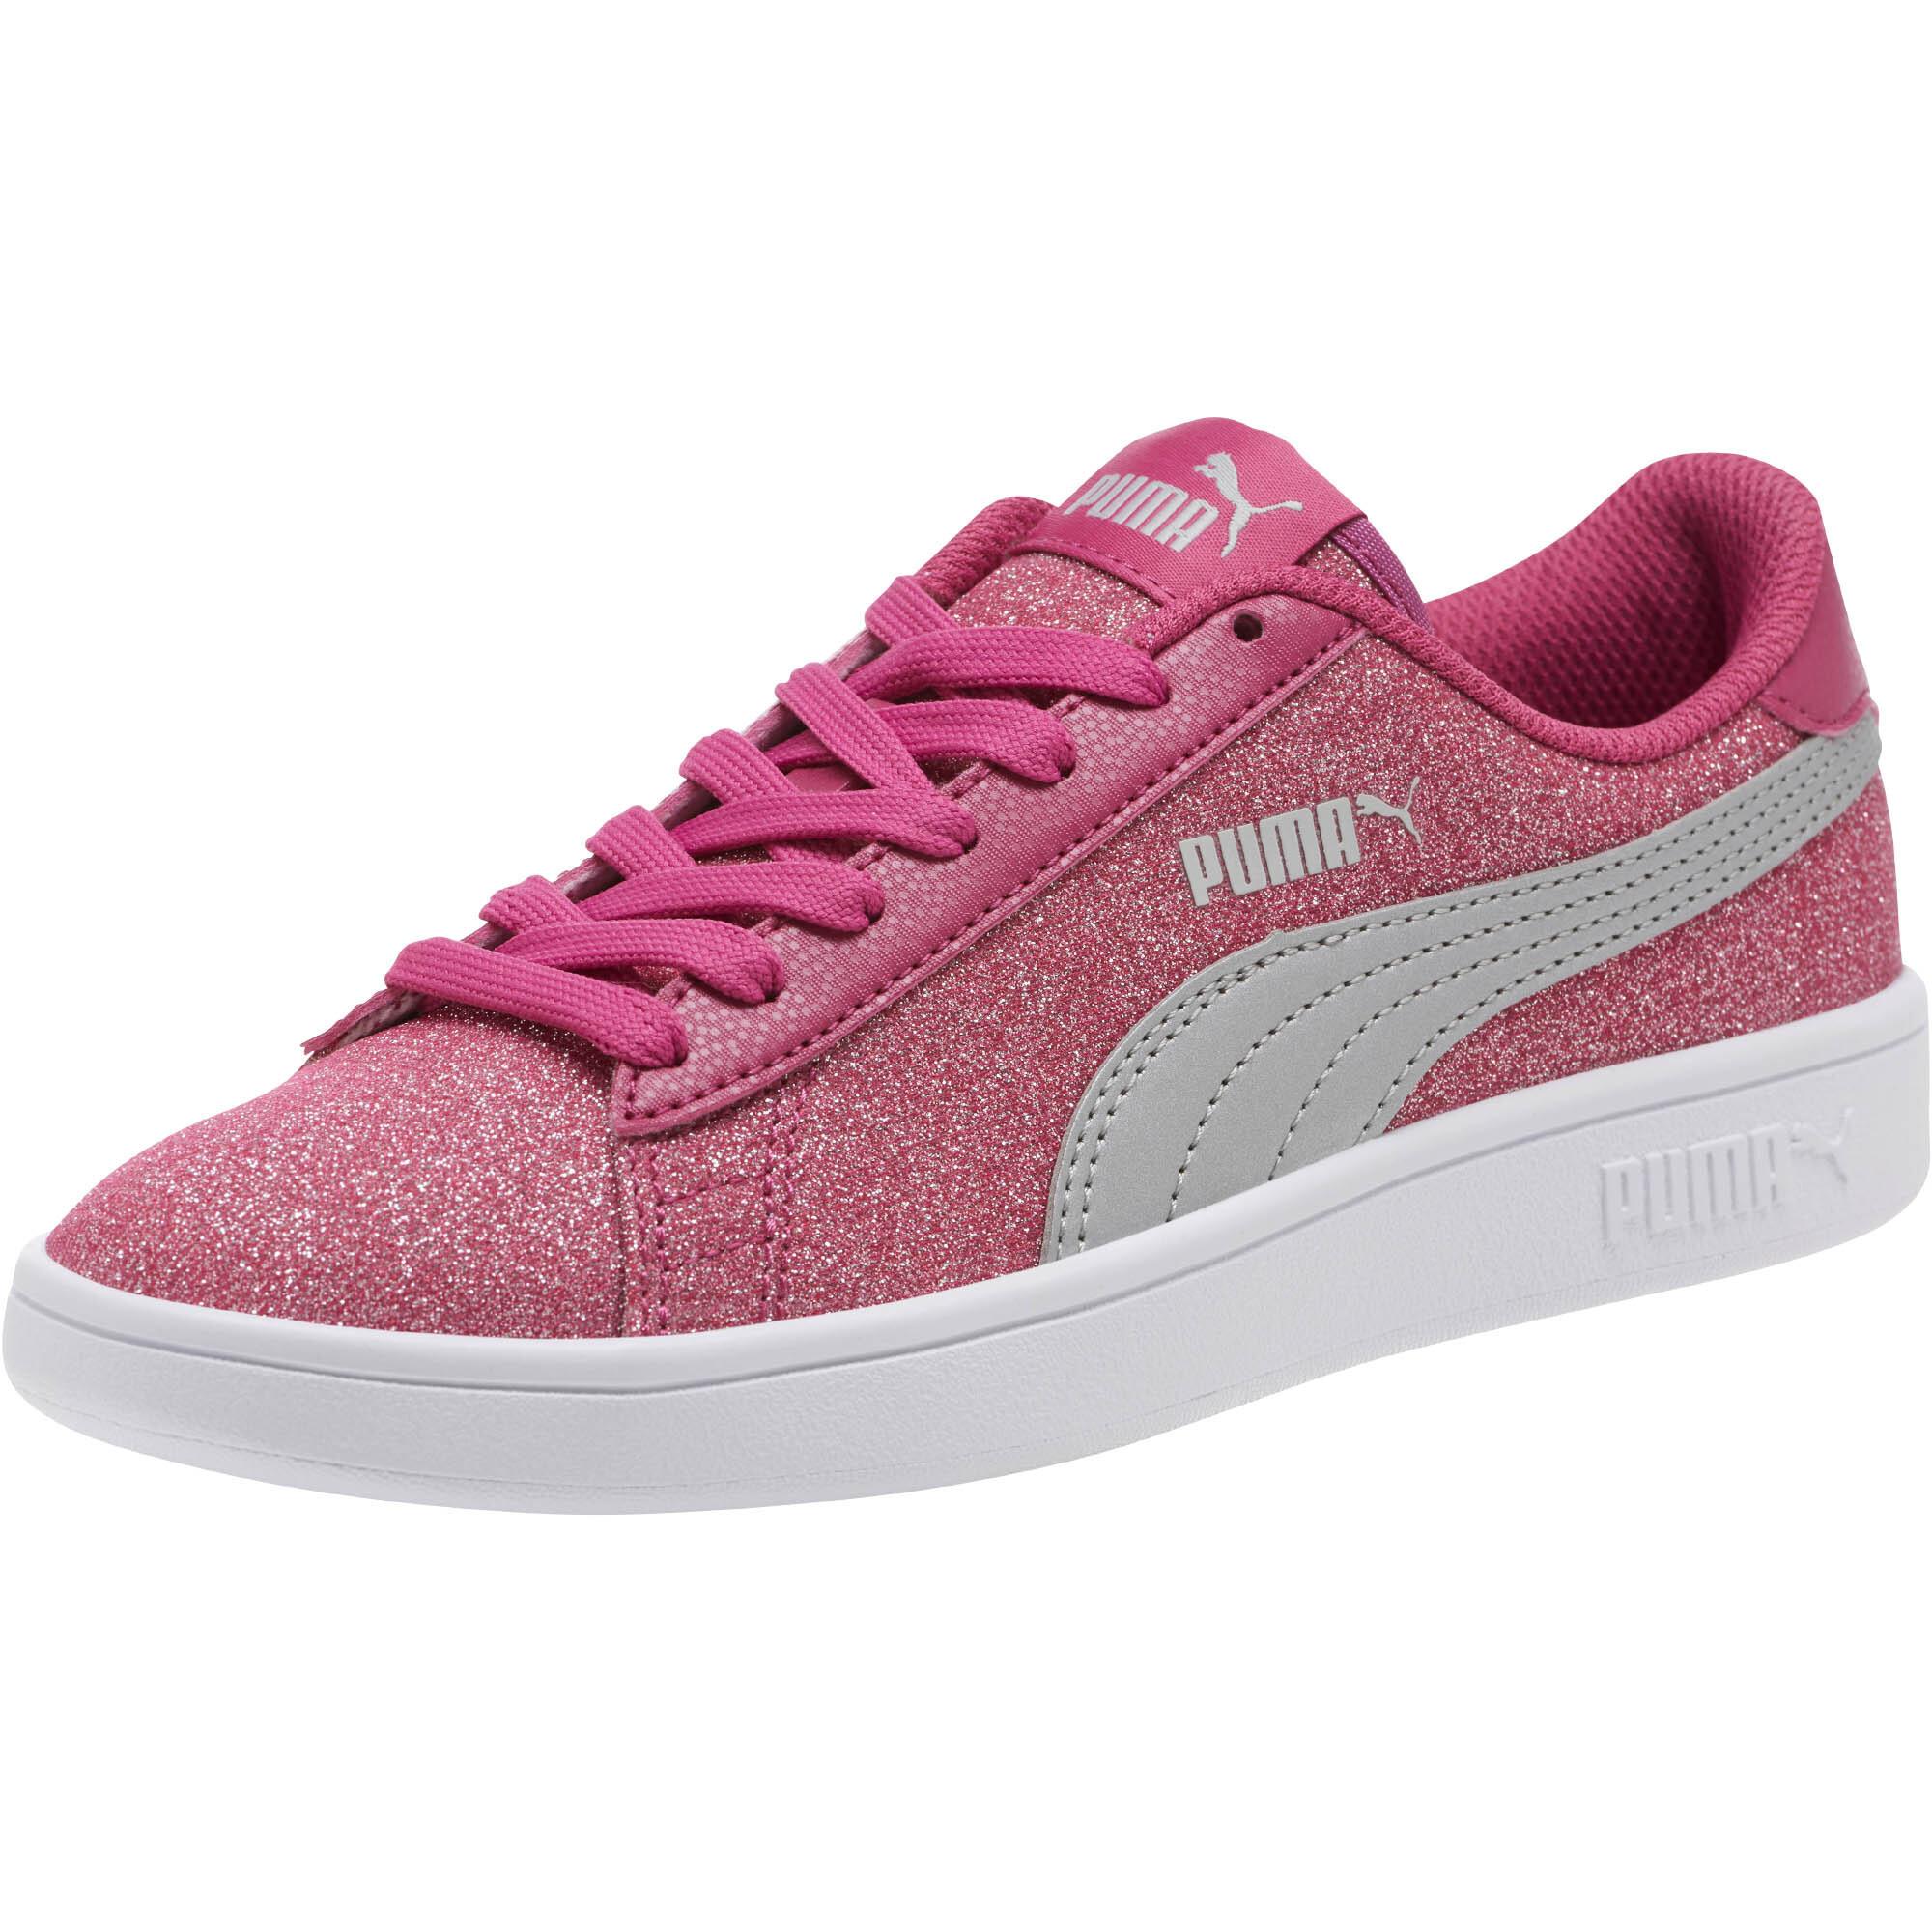 PUMA-Smash-v2-Glitz-Glam-Sneakers-JR-Girls-Shoe-Kids thumbnail 9